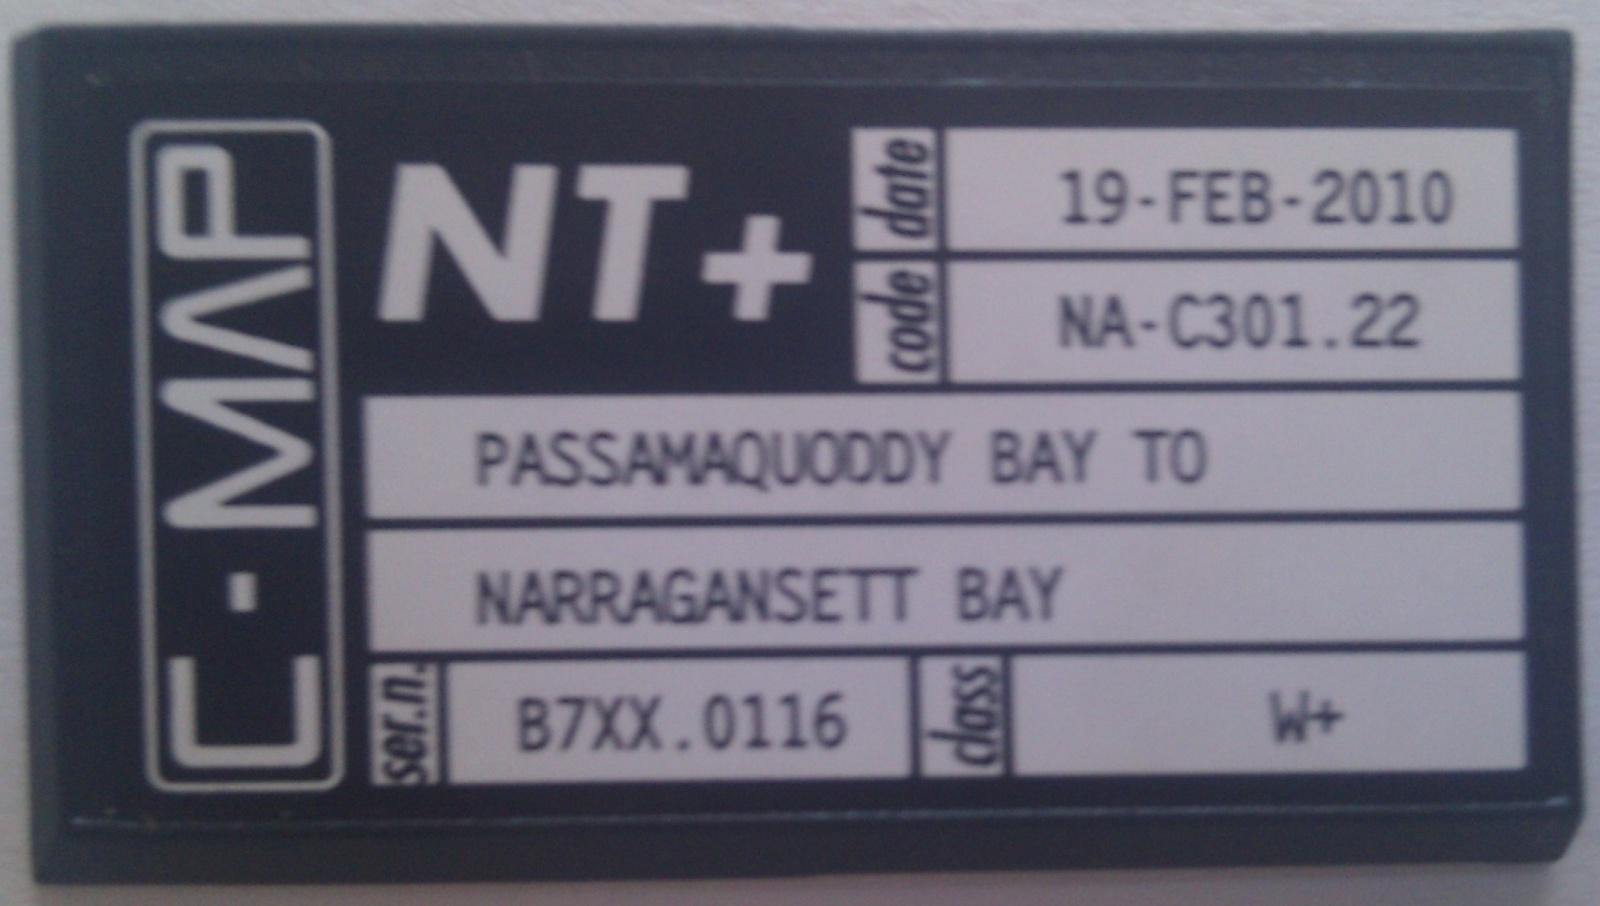 Click image for larger version  Name:C - Map NT+ Passamaquuoody Bay to Narragansett Bay.jpg Views:97 Size:290.3 KB ID:41389